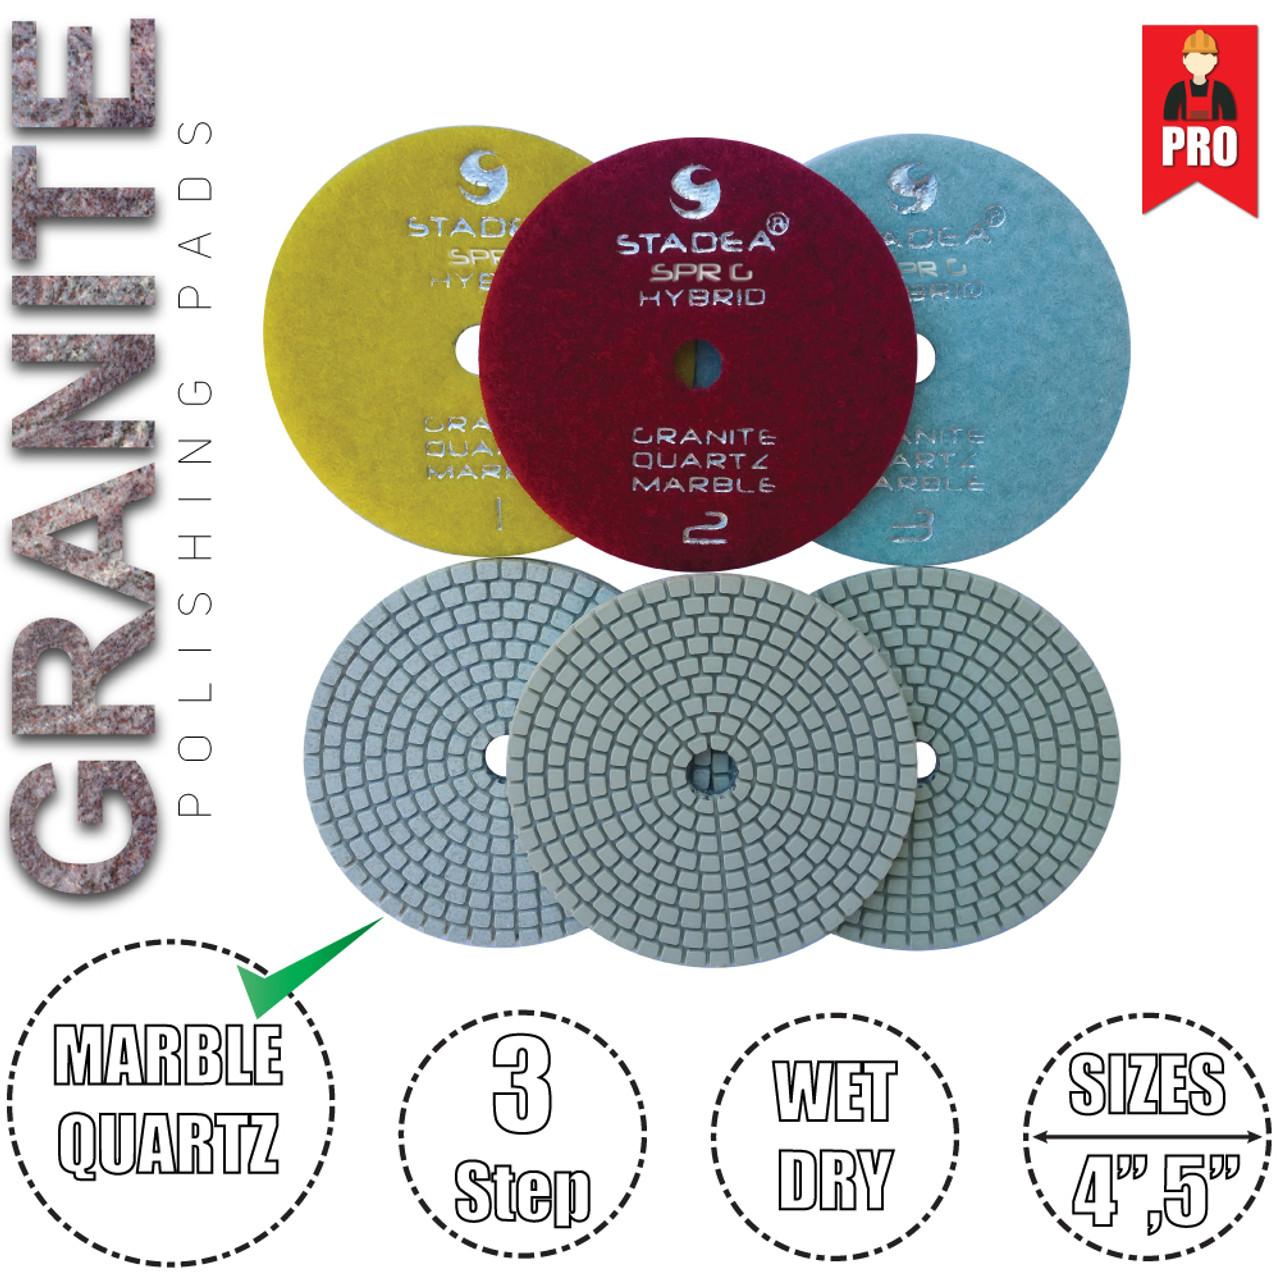 9 Sets = 66 Pieces Diamond Polishing Pads DRY Pad Granite Concrete Stone Marble